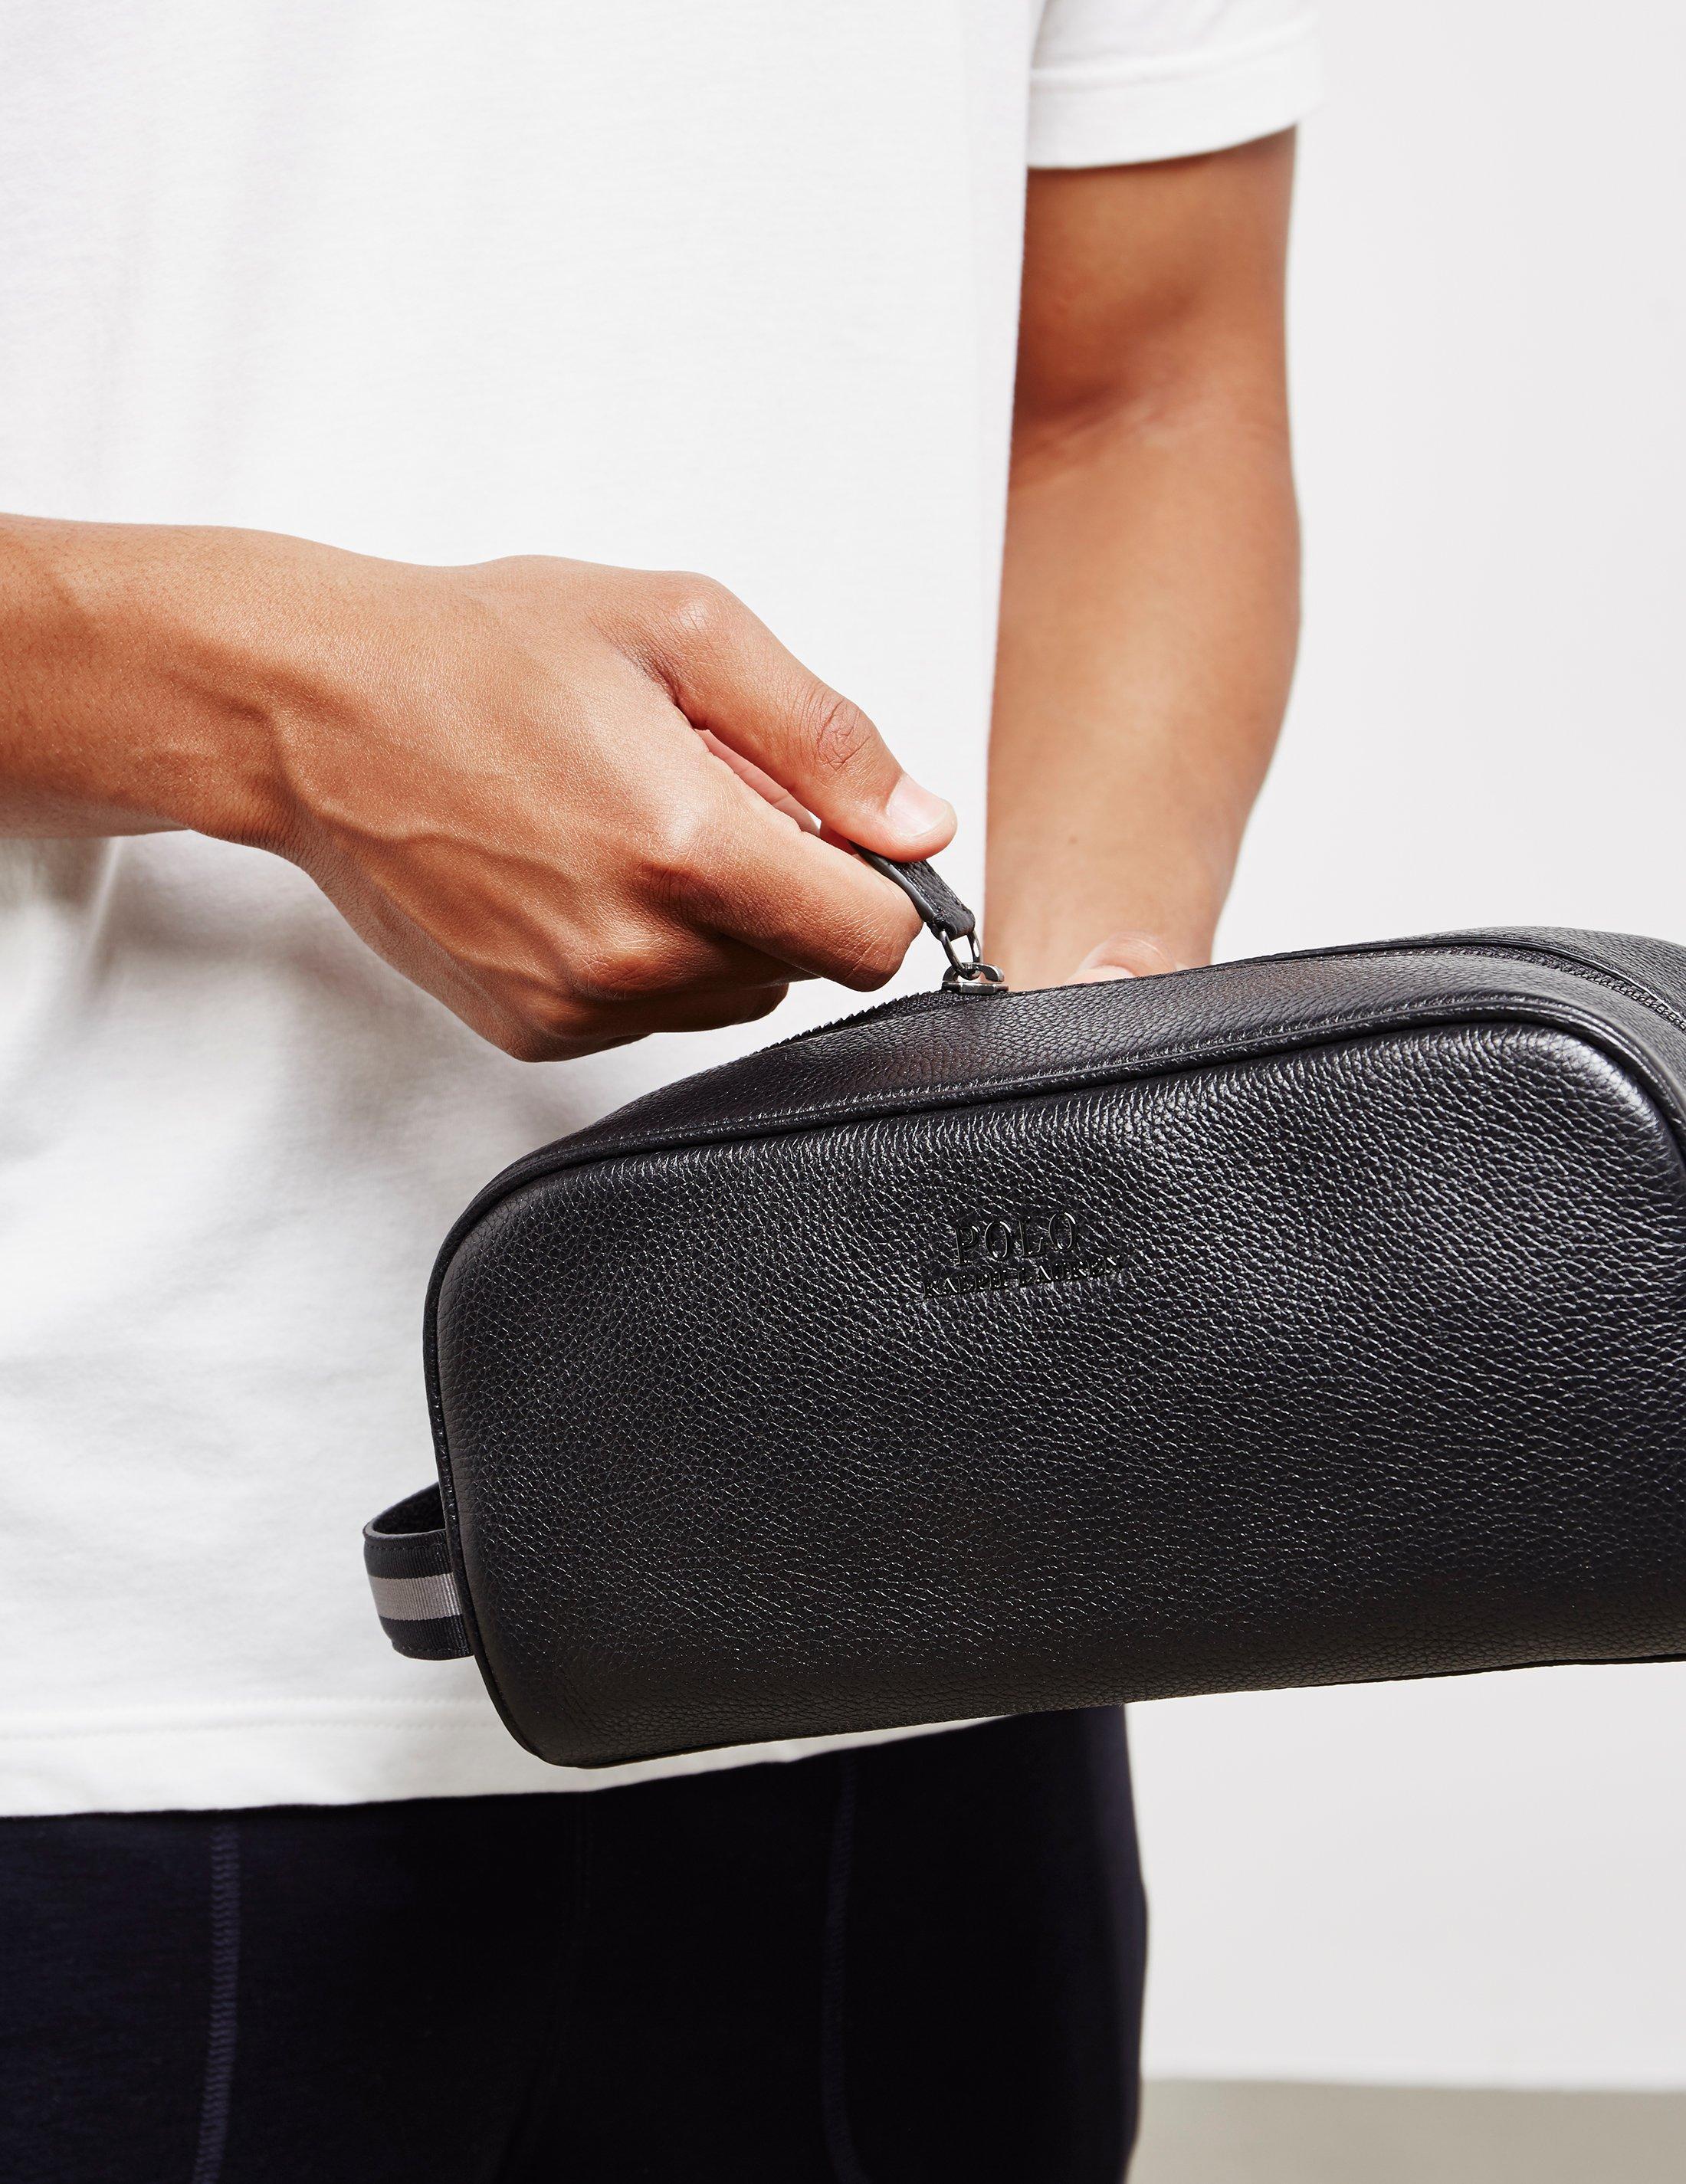 Lyst - Polo Ralph Lauren Mens Wash Bag - Online Exclusive Black in ... b197d9e46a